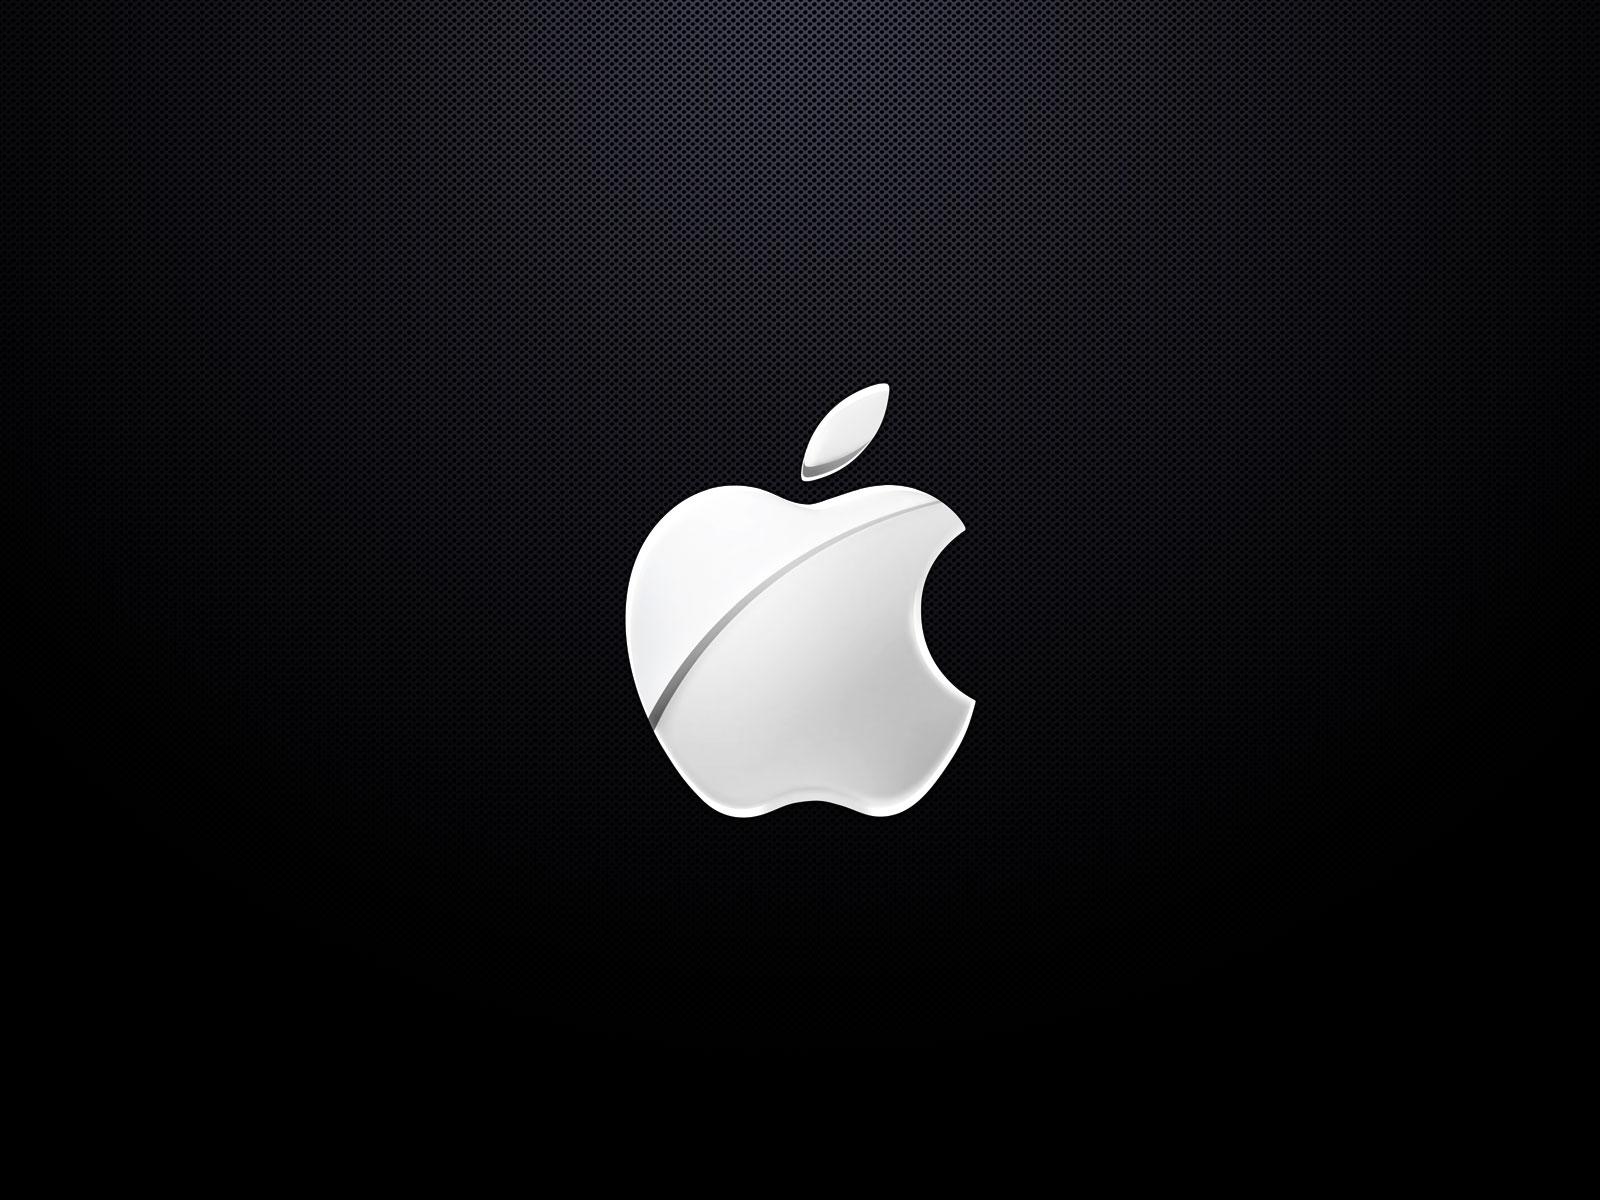 Logos Pictures: Apple Logo